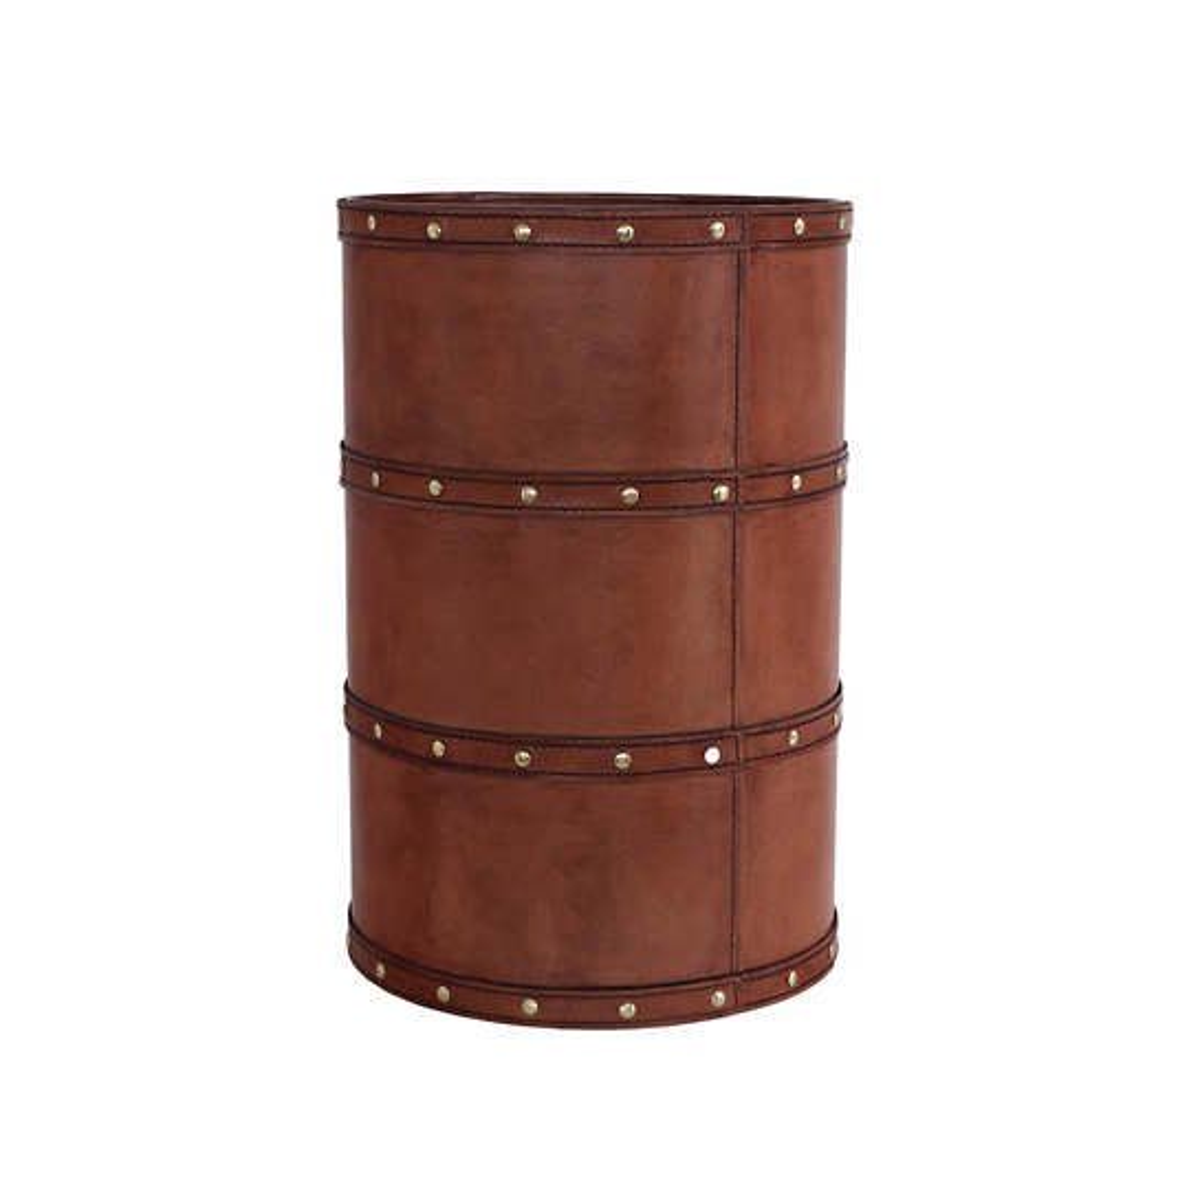 Holmes Leather Cognac Wastebasket